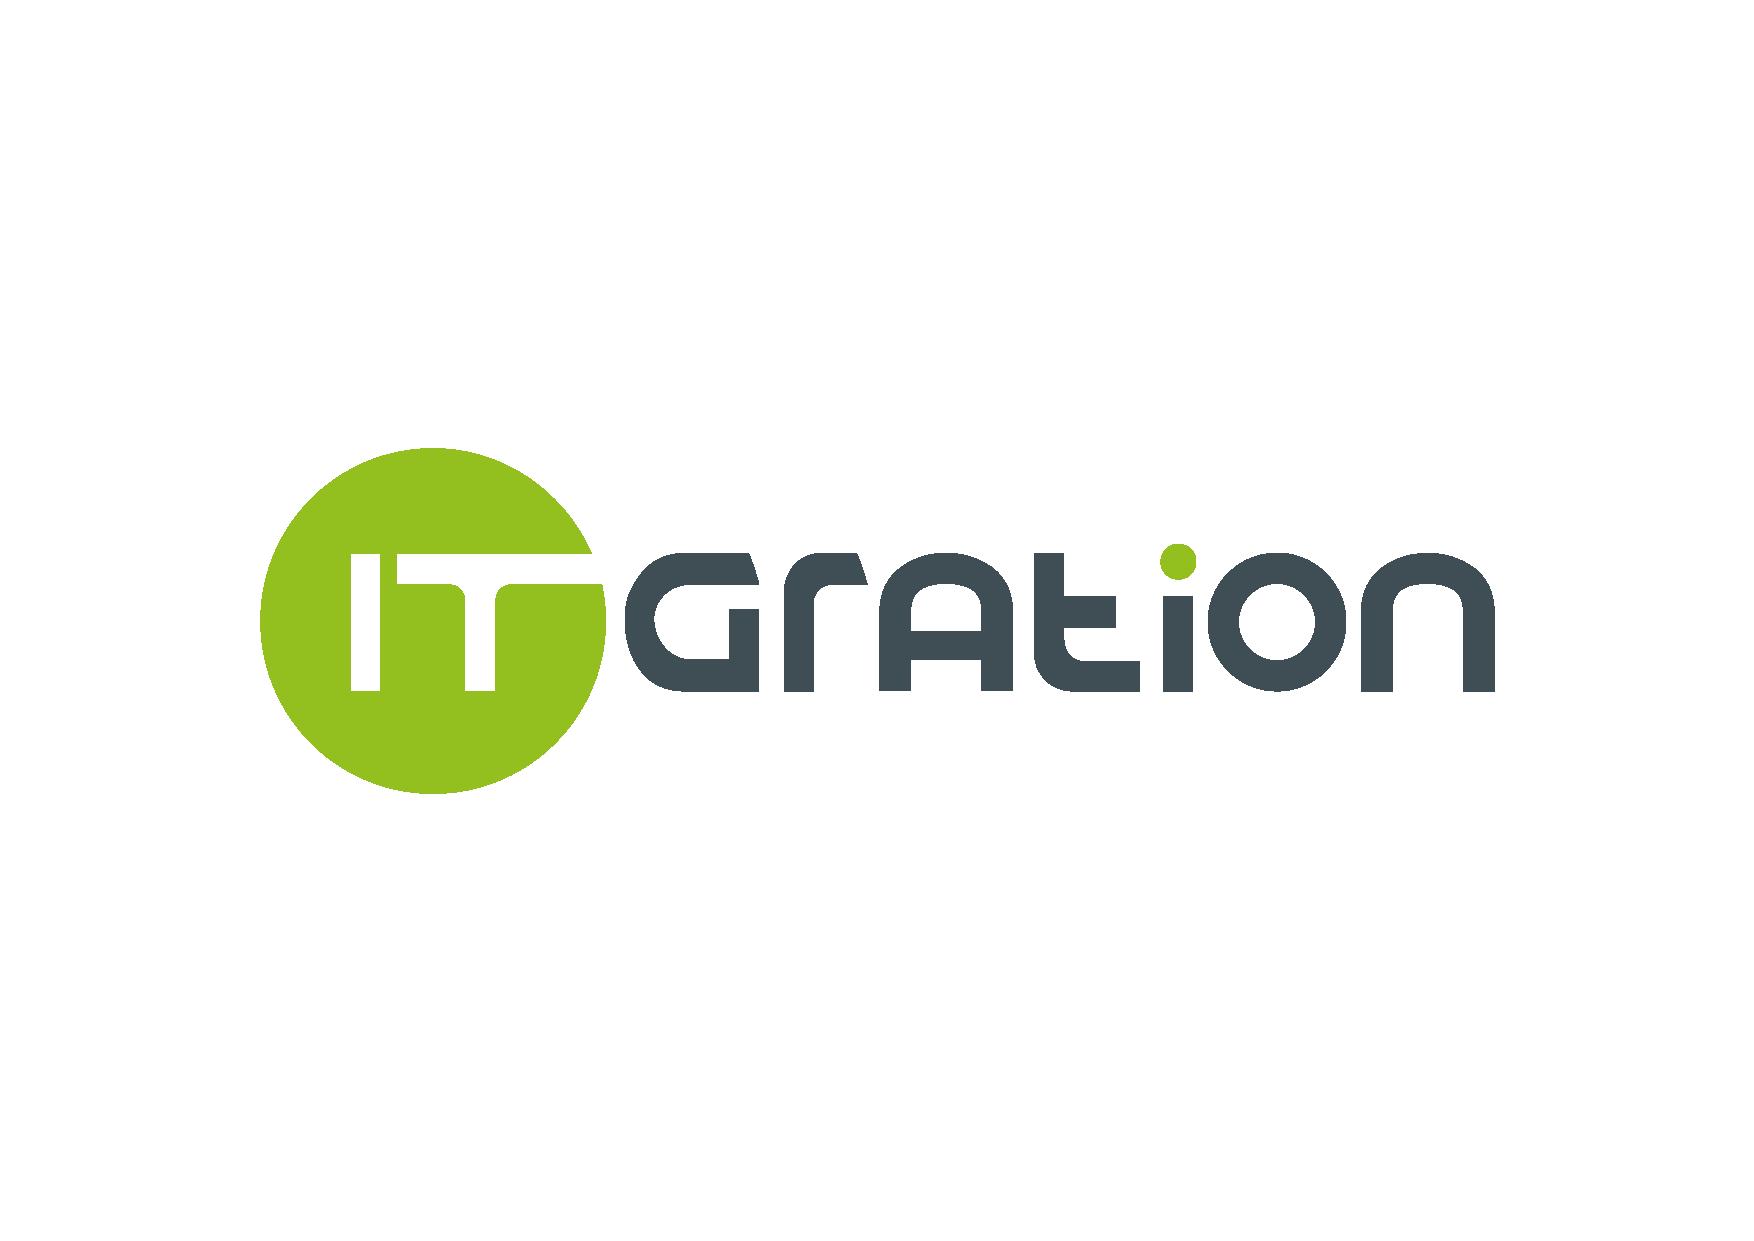 ITgration GmbH